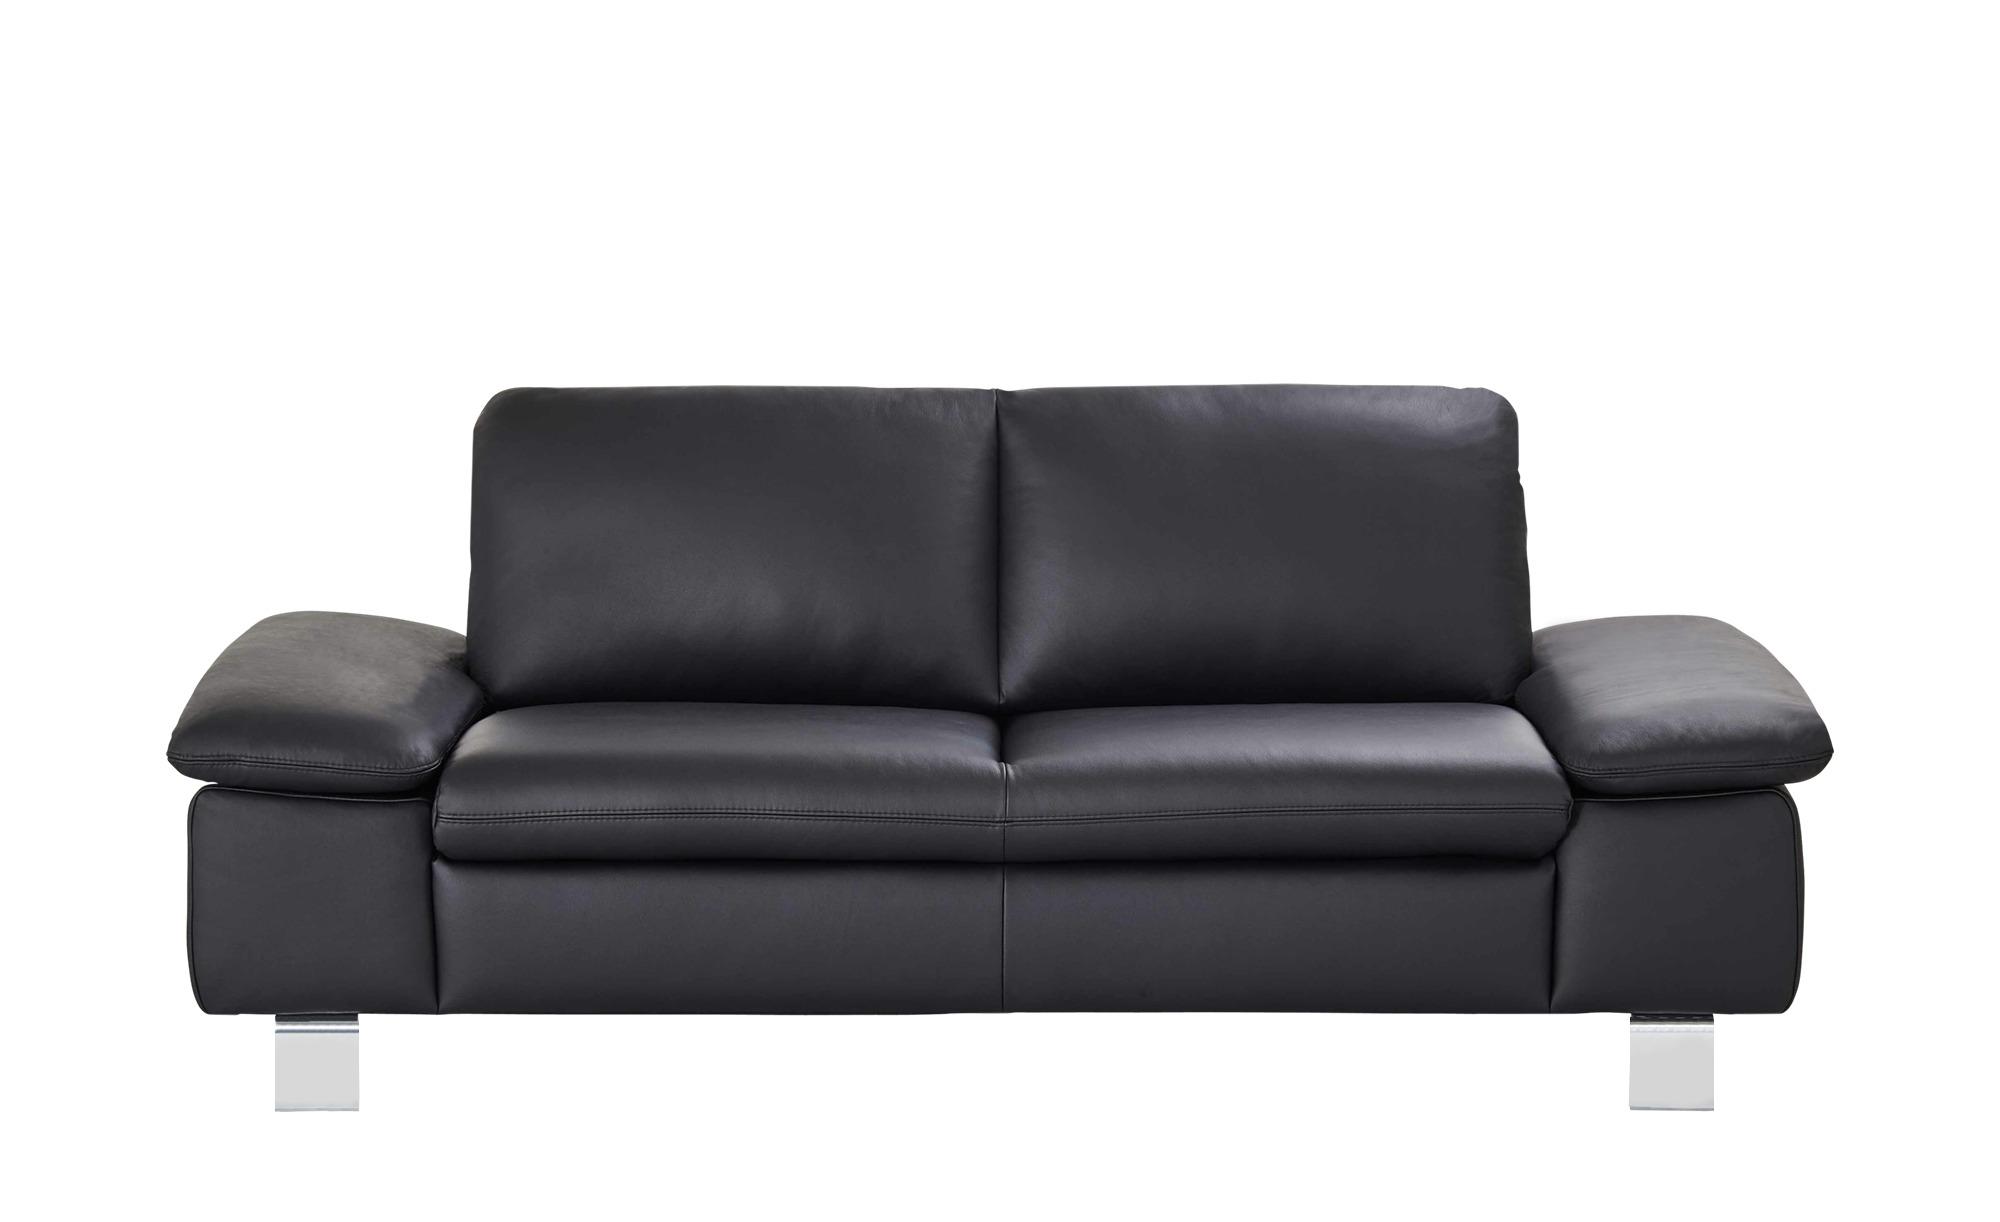 smart sofa finola breite 181 cm h he 83 cm online kaufen. Black Bedroom Furniture Sets. Home Design Ideas